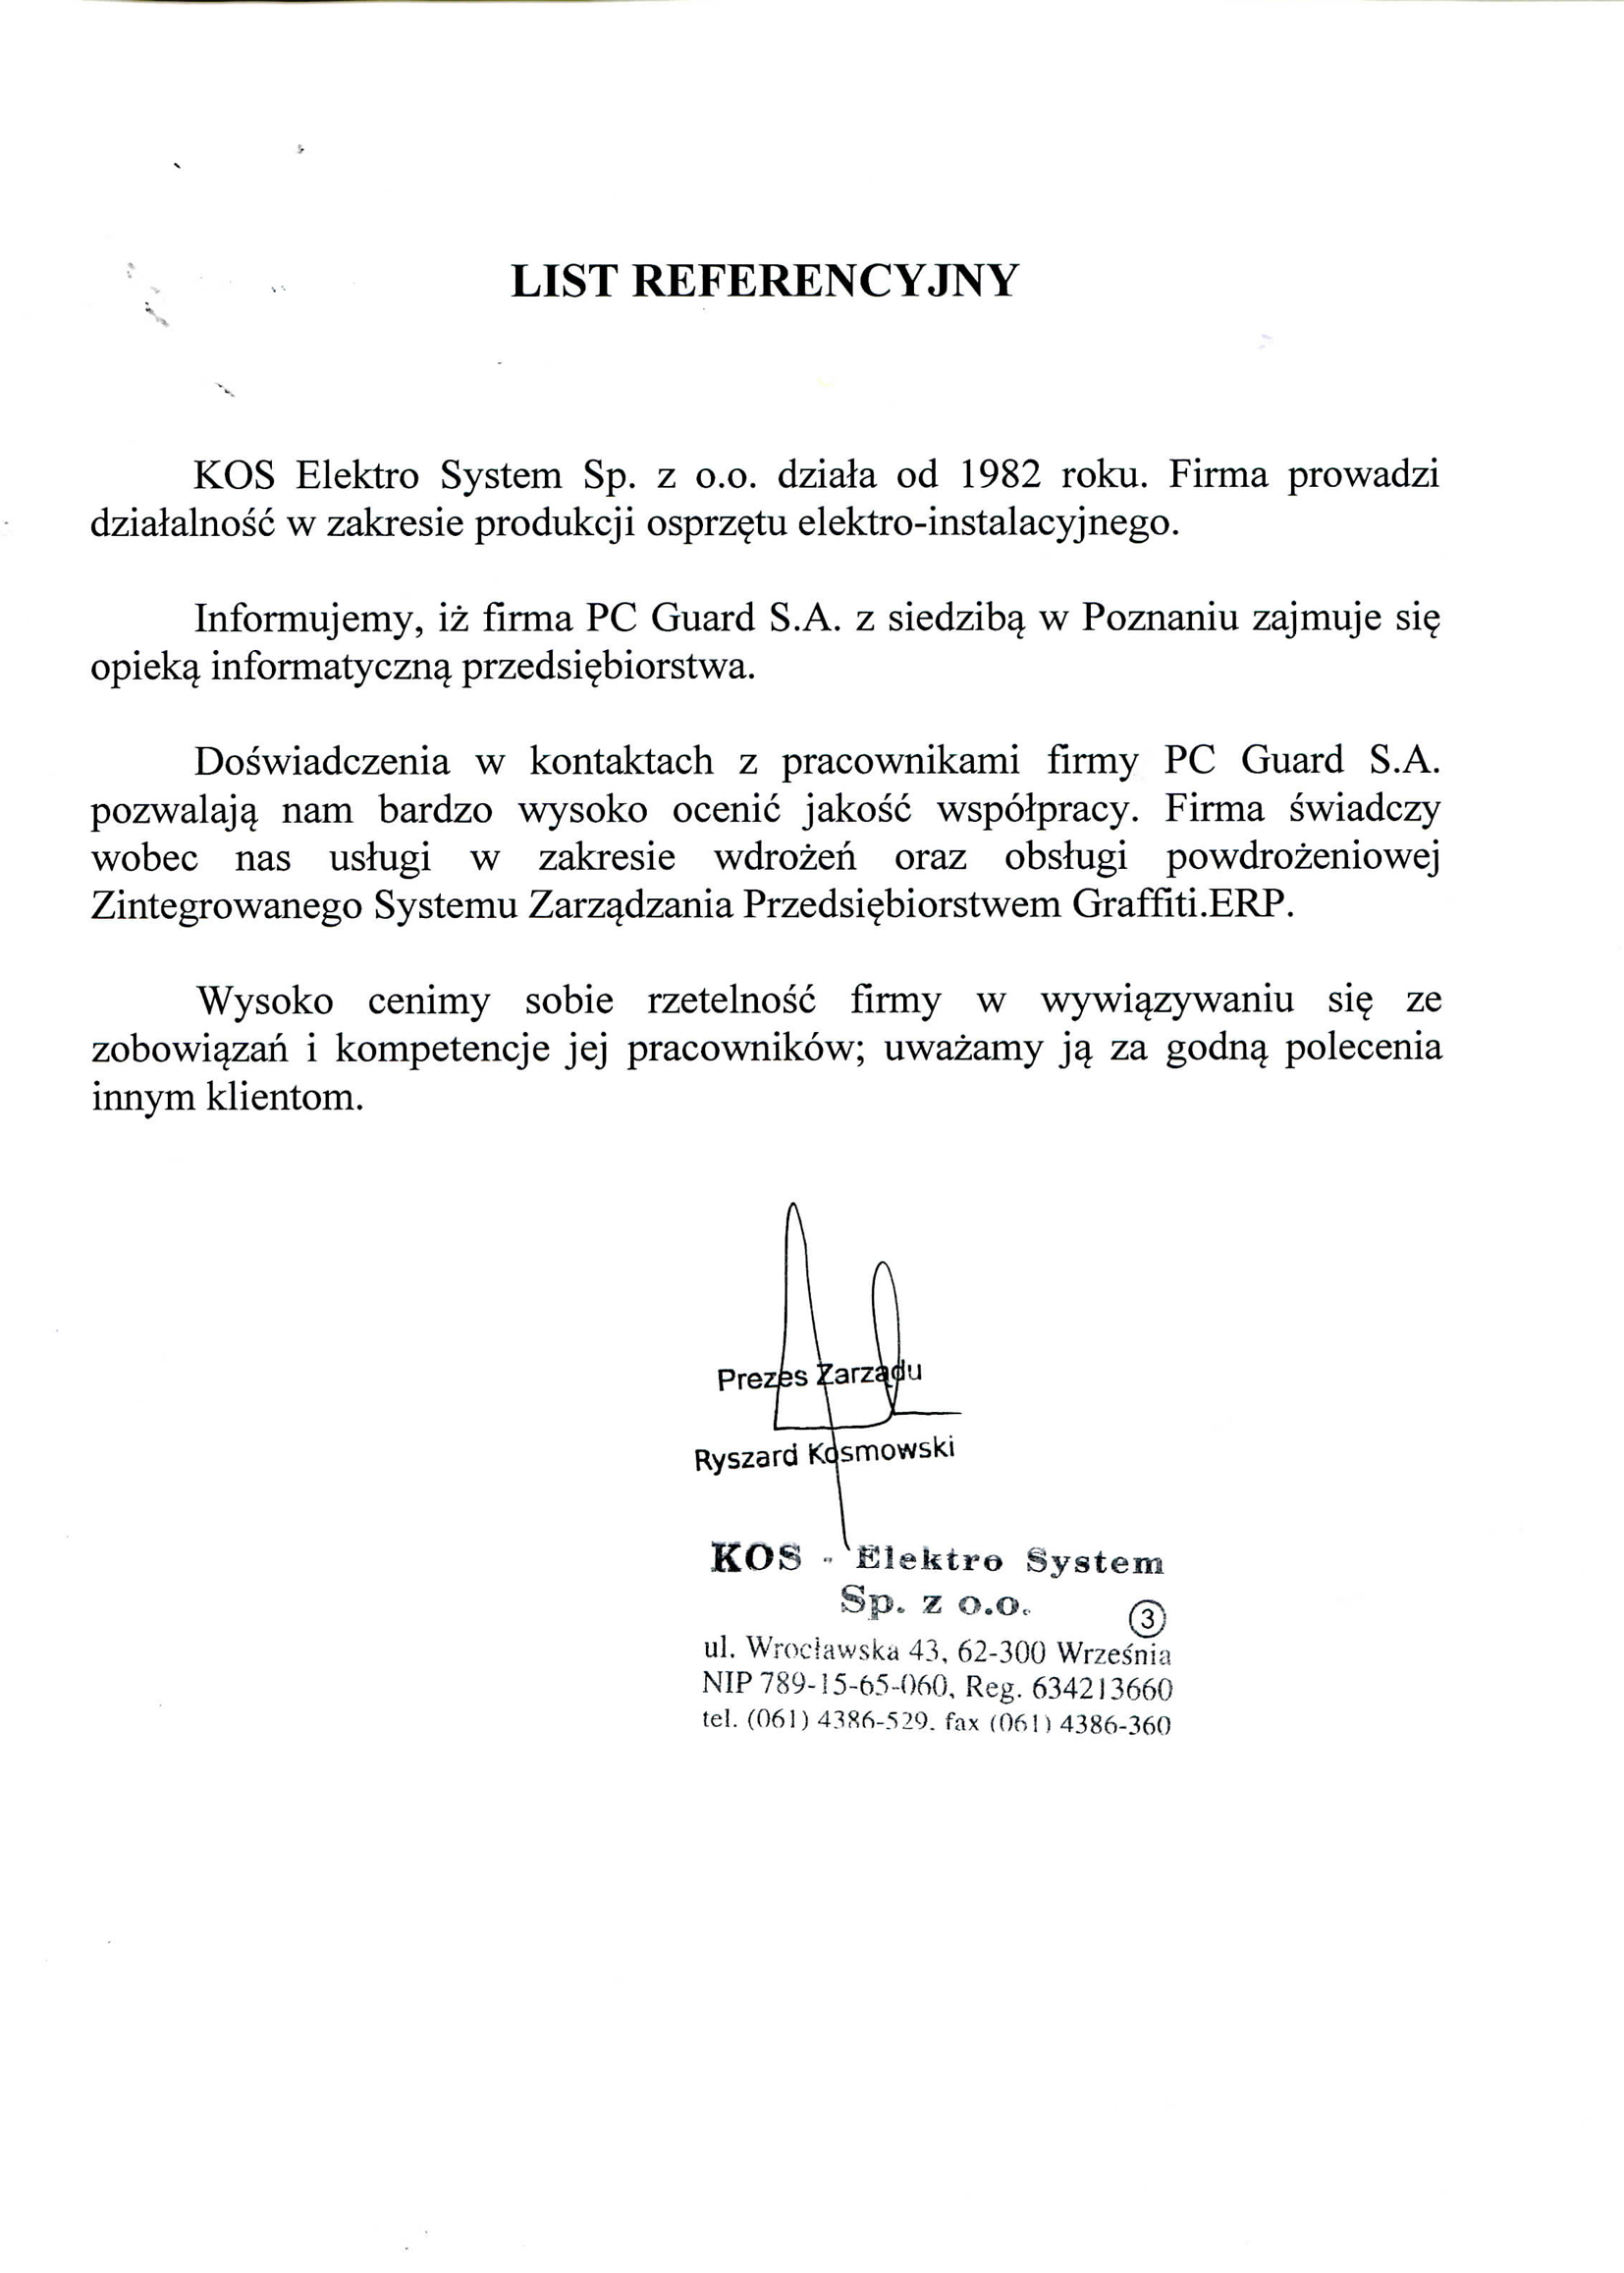 KOS – Elektro System Sp. z o.o.